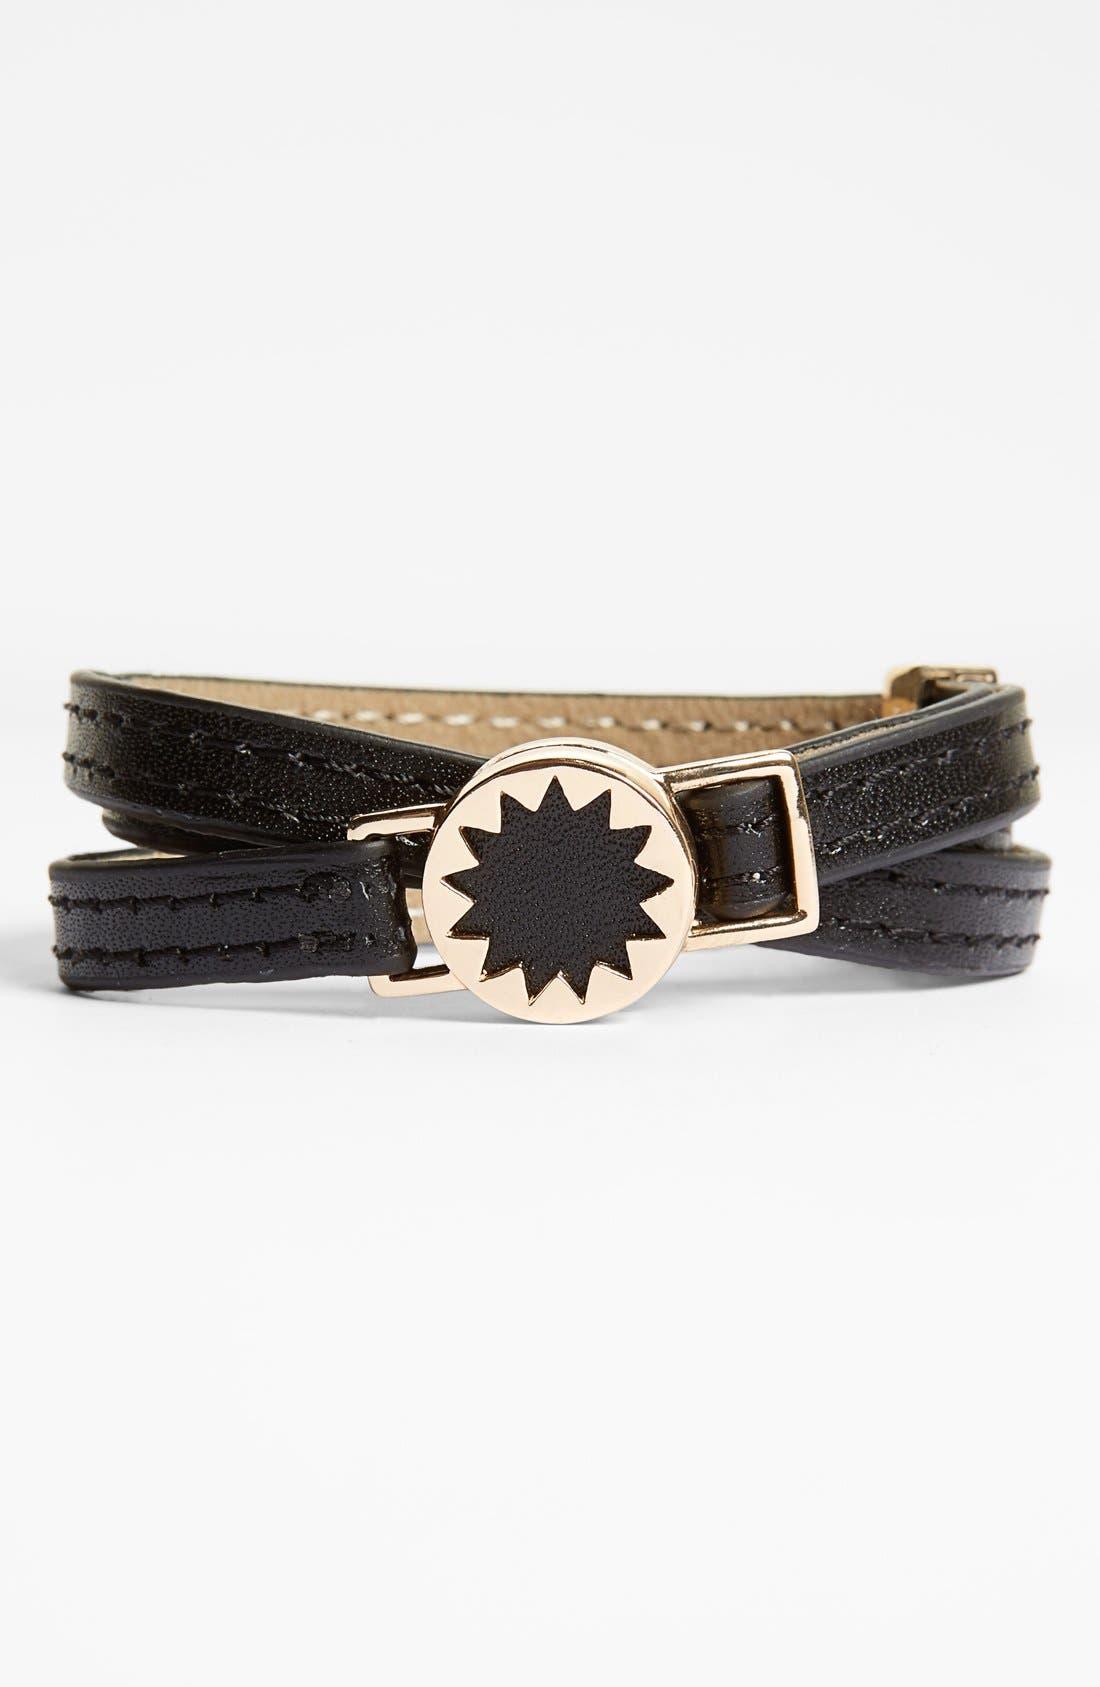 HOUSE OF HARLOW 1960,                             Sunburst Leather Wrap Bracelet,                             Main thumbnail 1, color,                             001